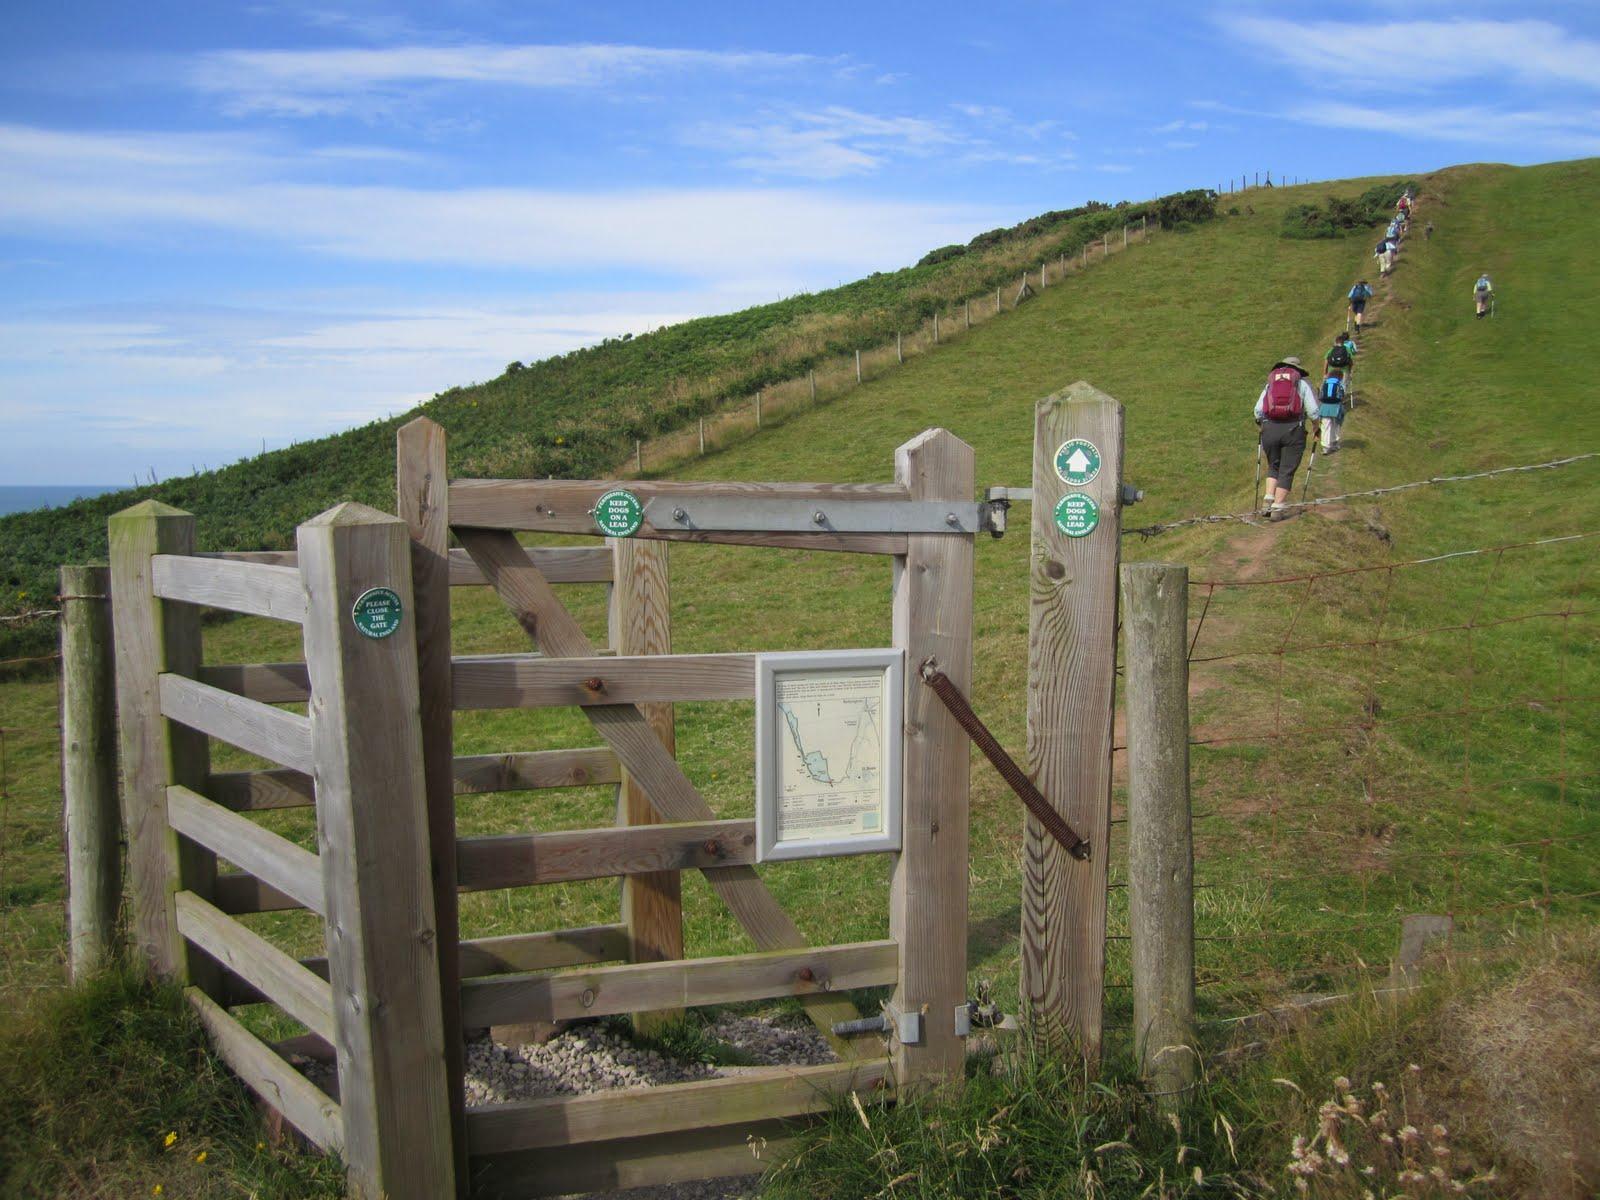 TravelMarx: Kissing Gates and Stiles - Wainwright Coast to